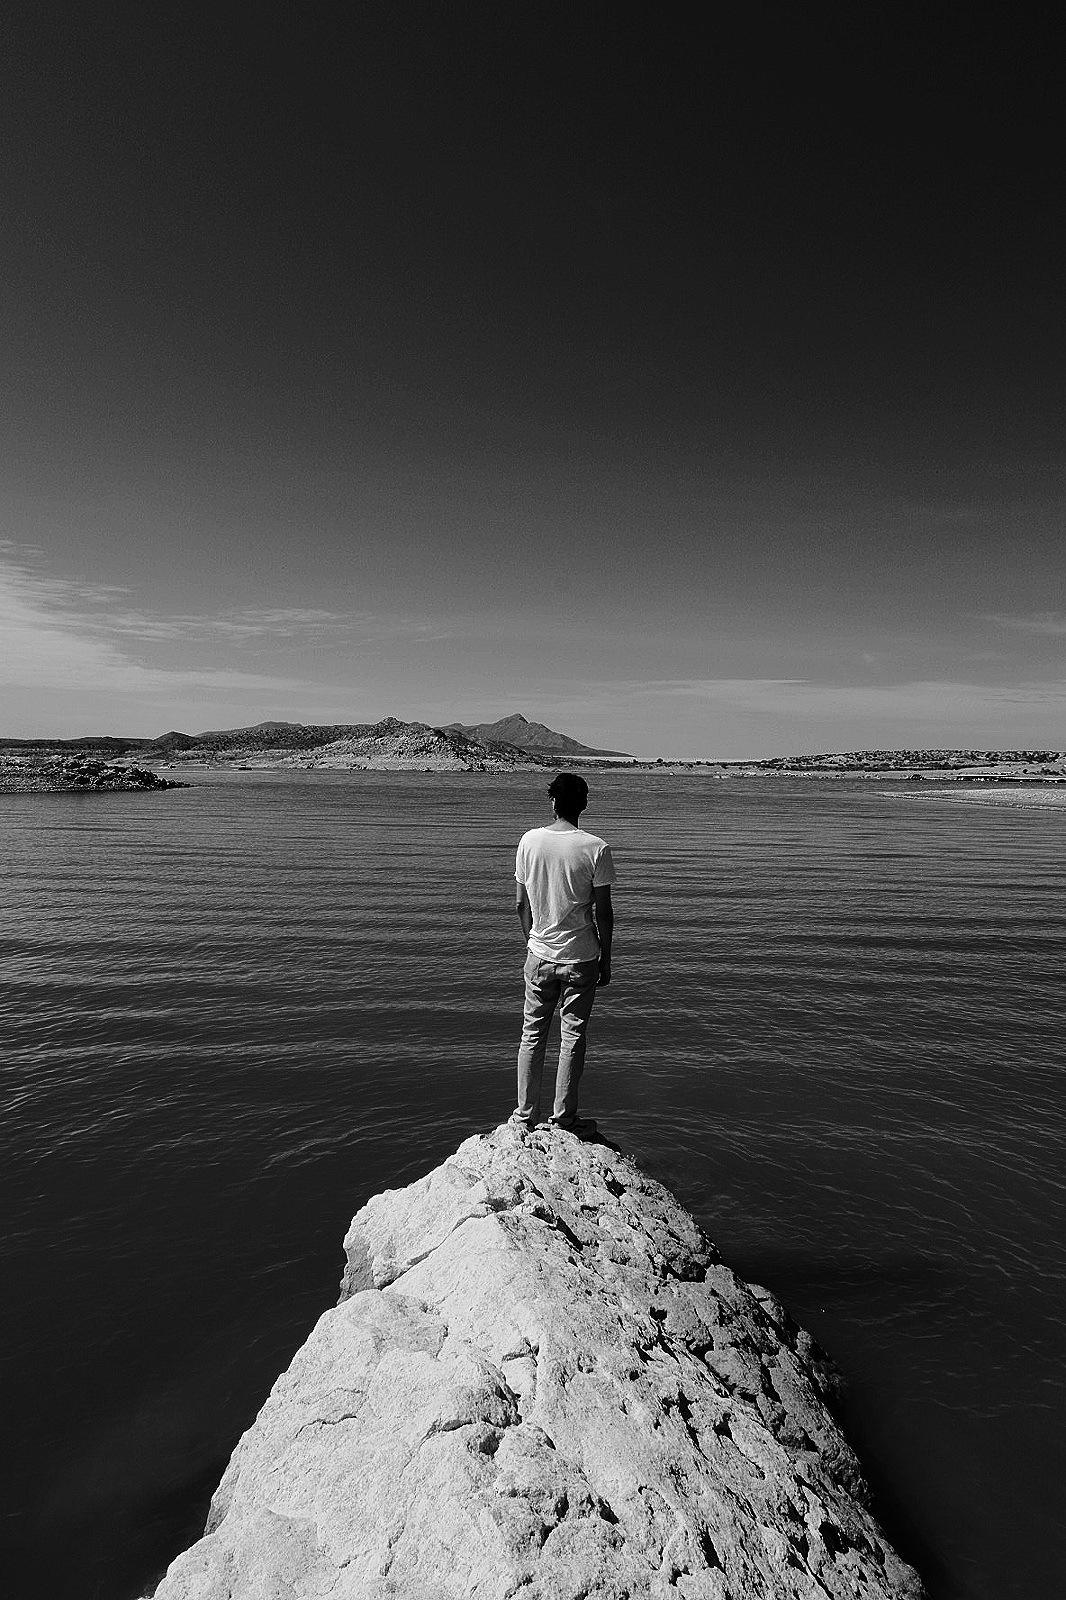 vastness by Bryan Inostroza